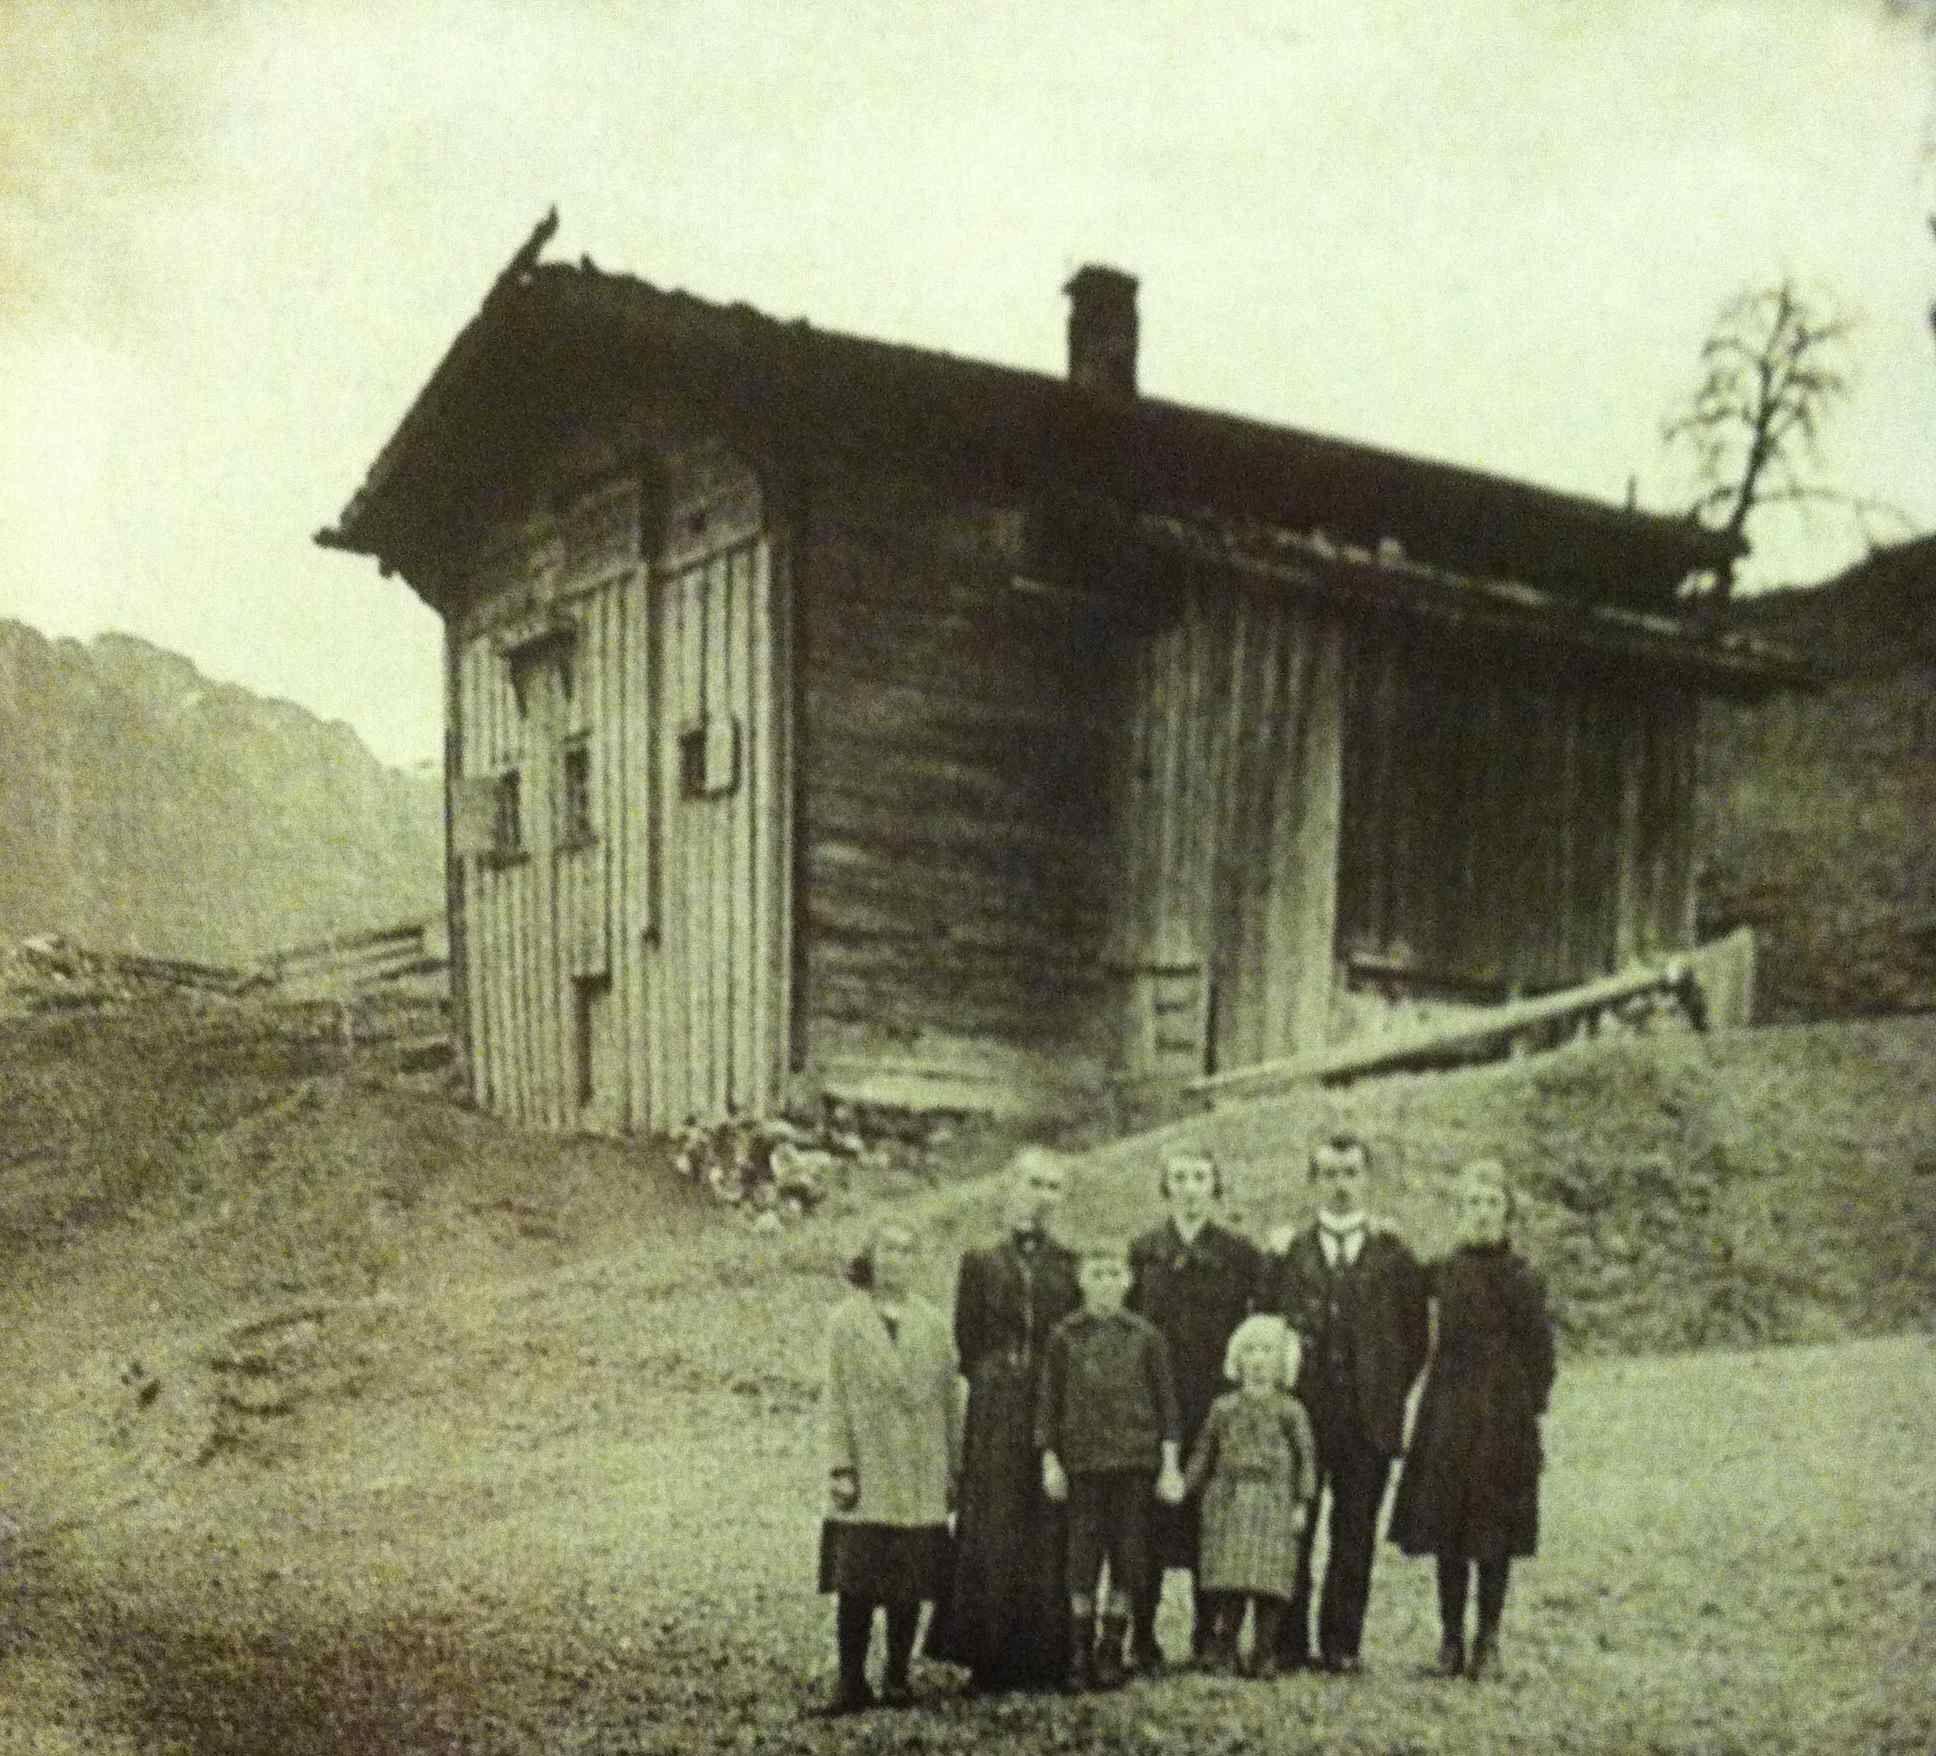 Original Truog House Gugalun Versam Peter Zumthor Peter Zumthor